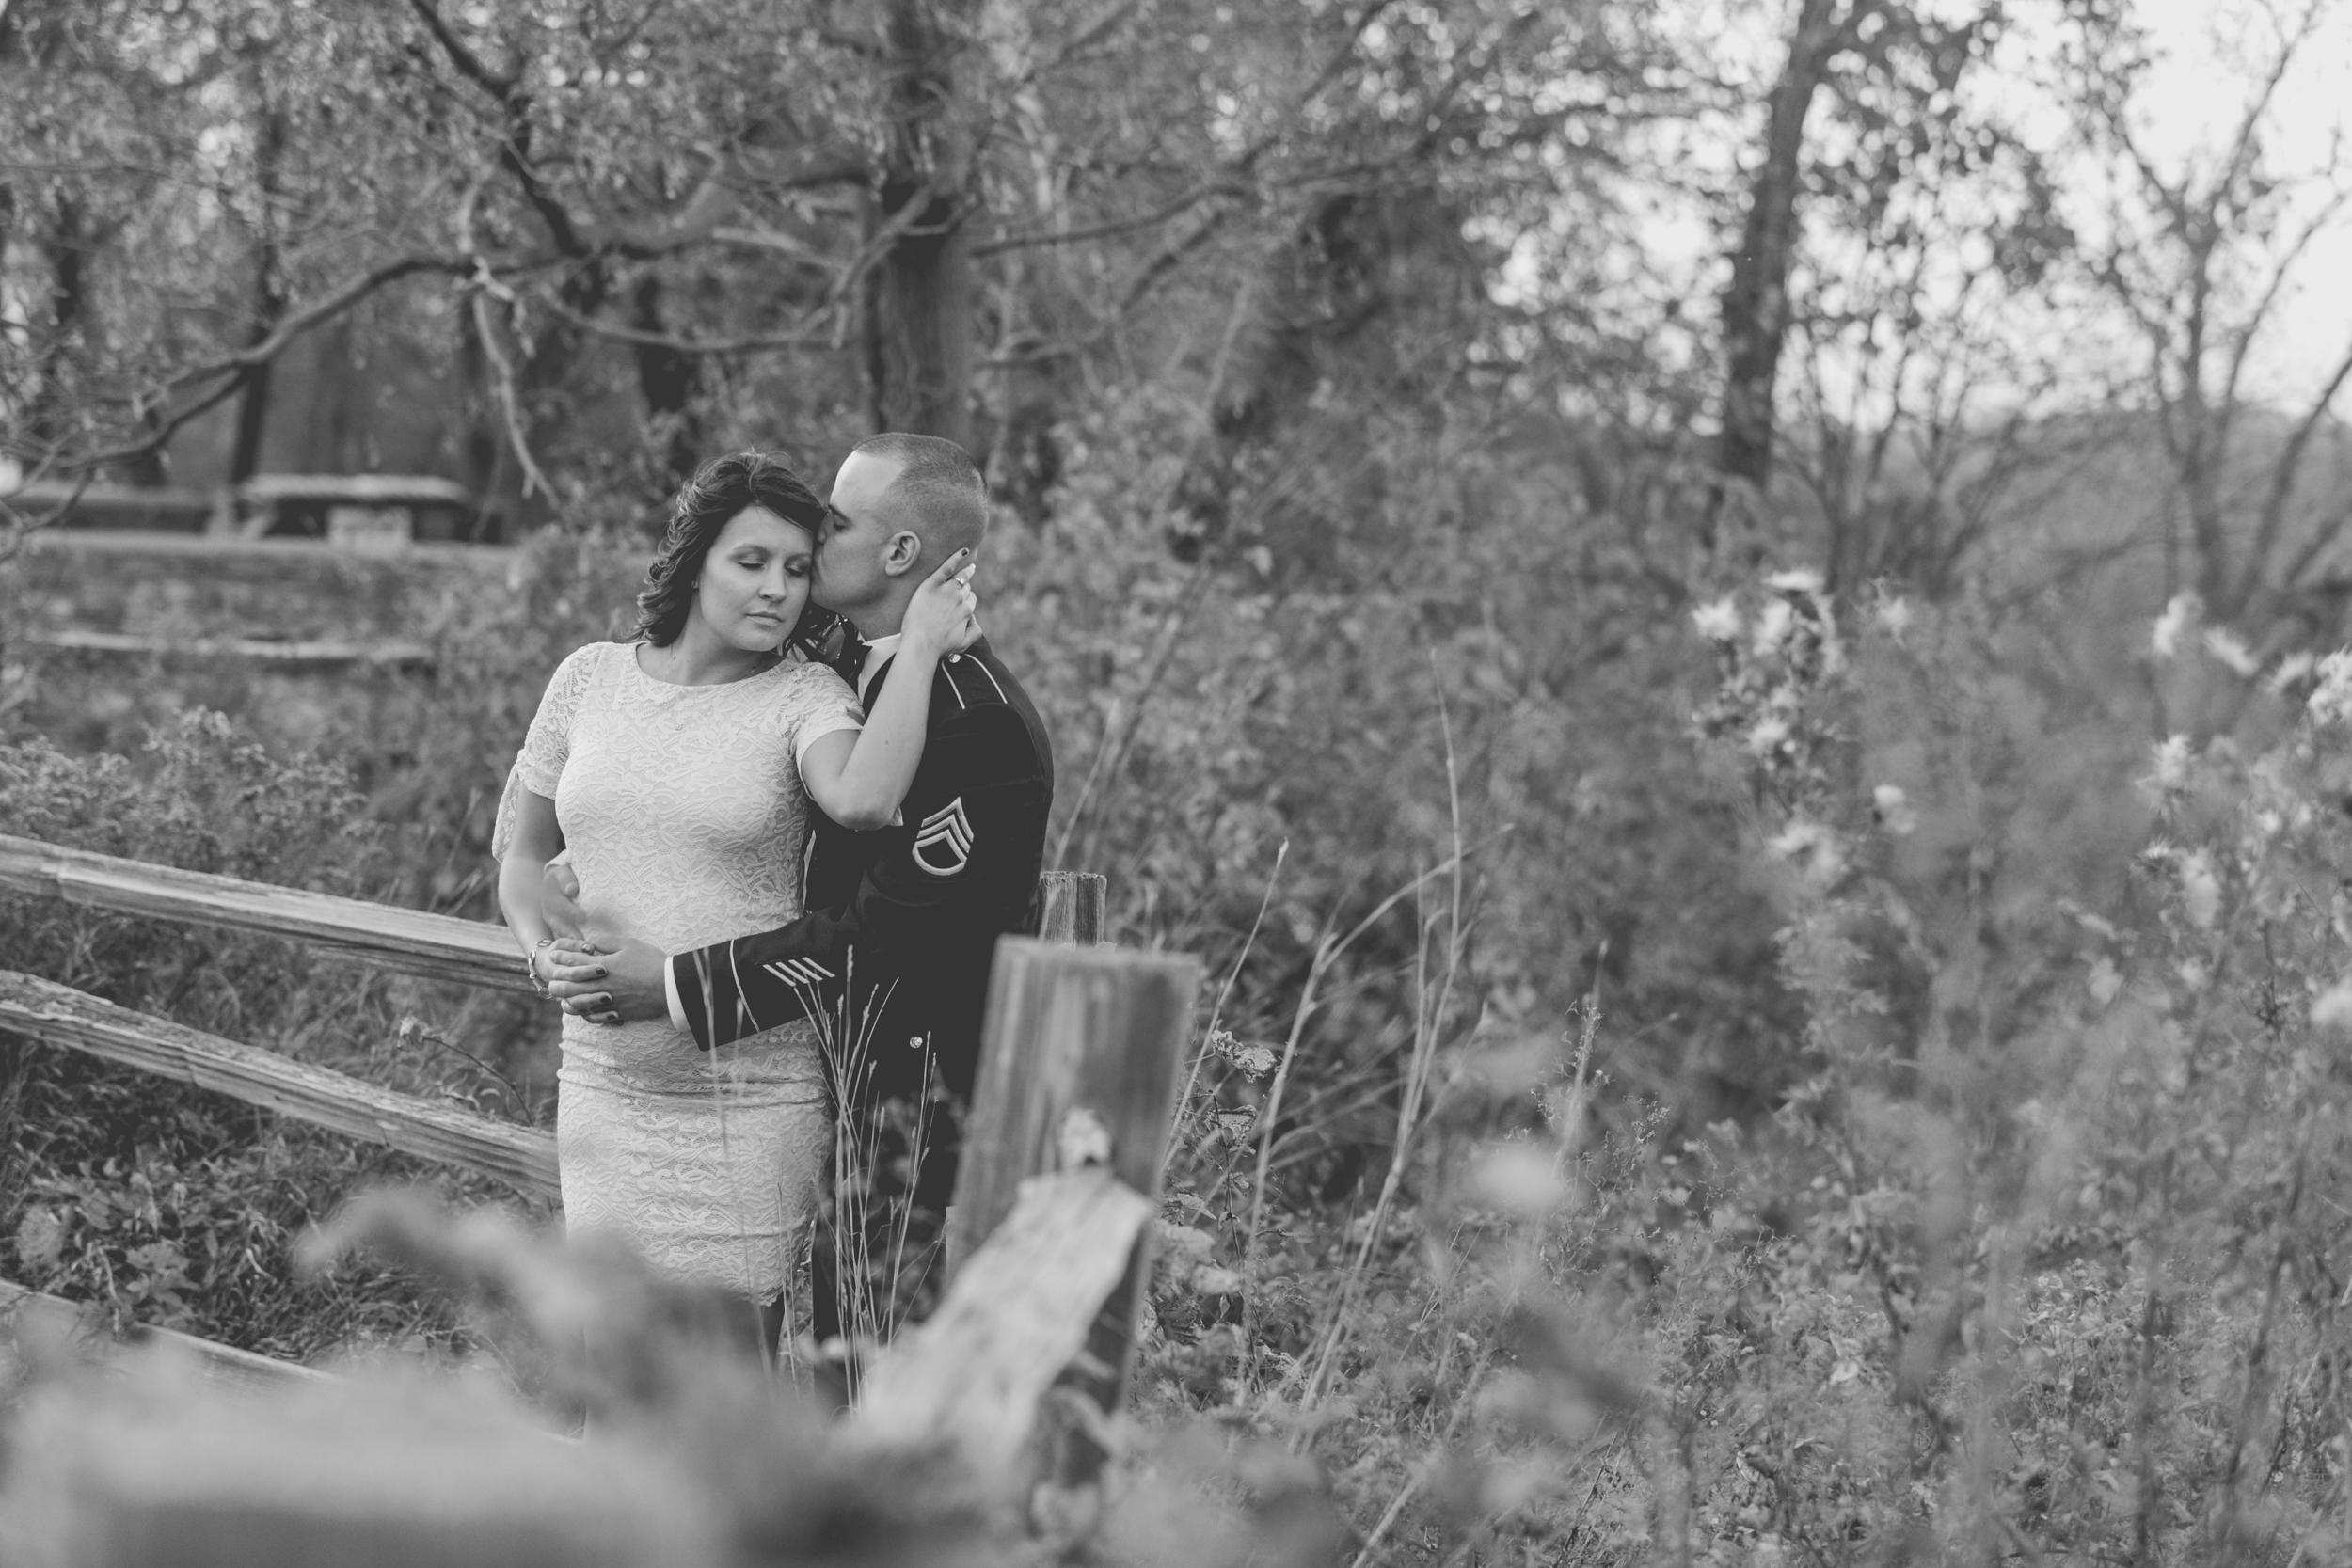 Fort Snelling Elopement St. Paul, MN, Fort Snelling Elopement, Military Elopement, Intimate Military Wedding, intimate elopement wedding-www.rachelsmak.com40.jpg